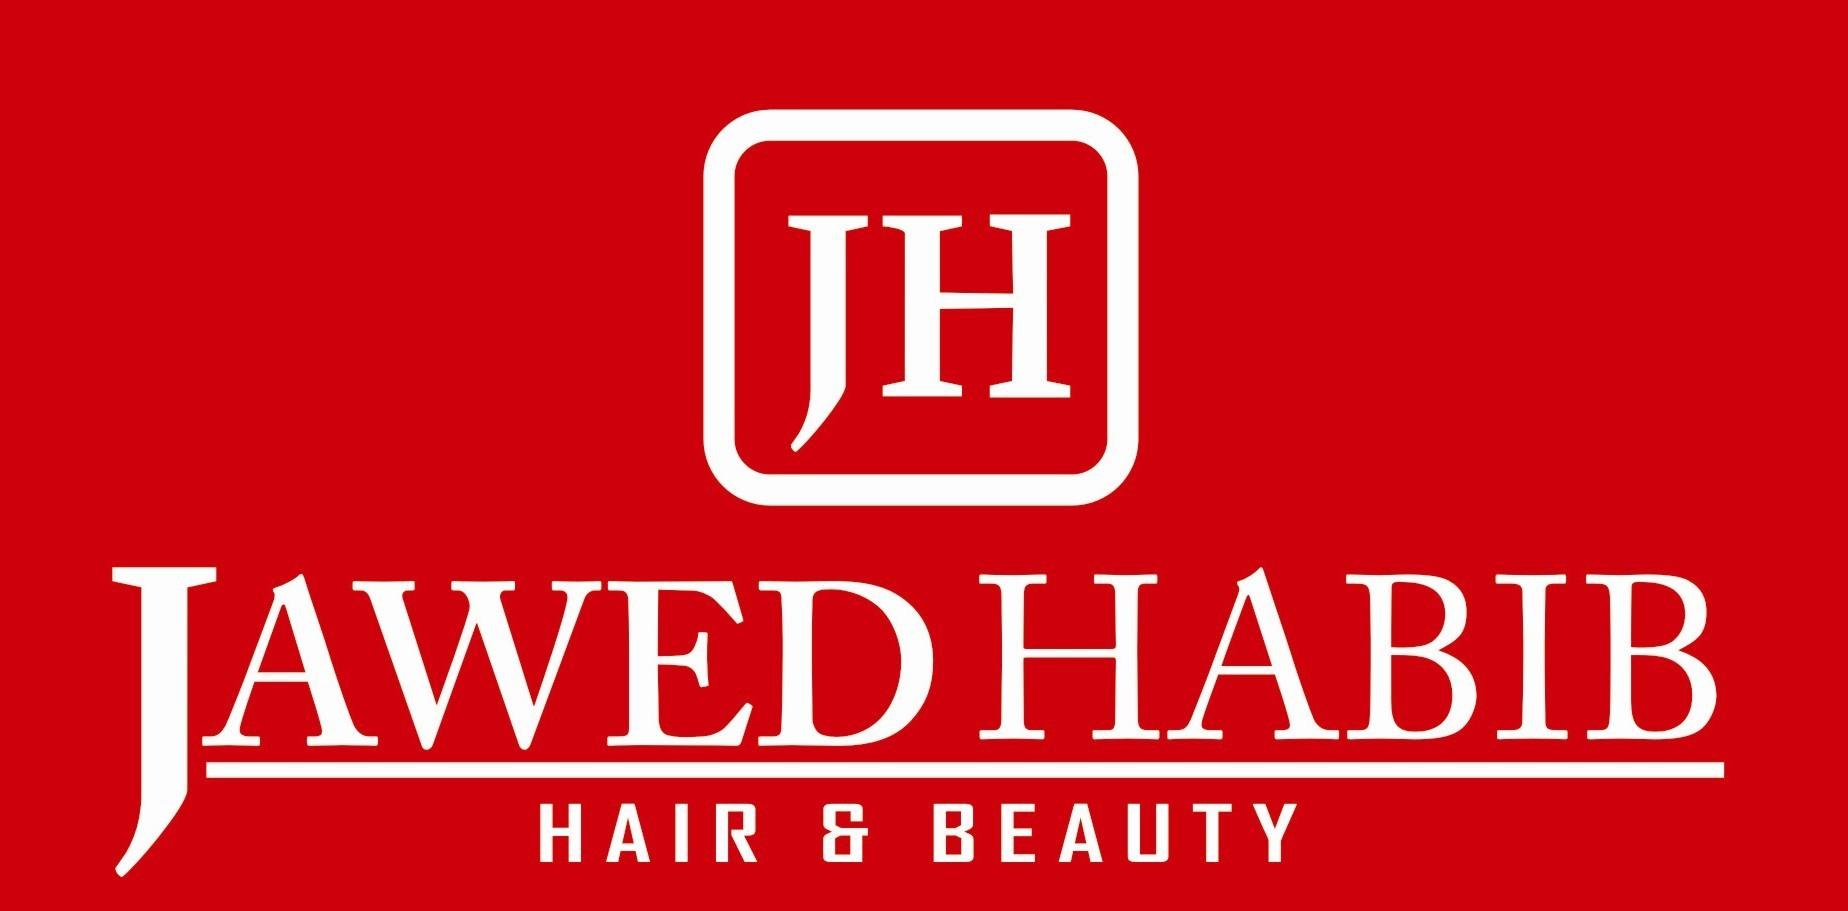 Jawed Habib Hair & Beauty Salons - Viman Nagar - Pune Image